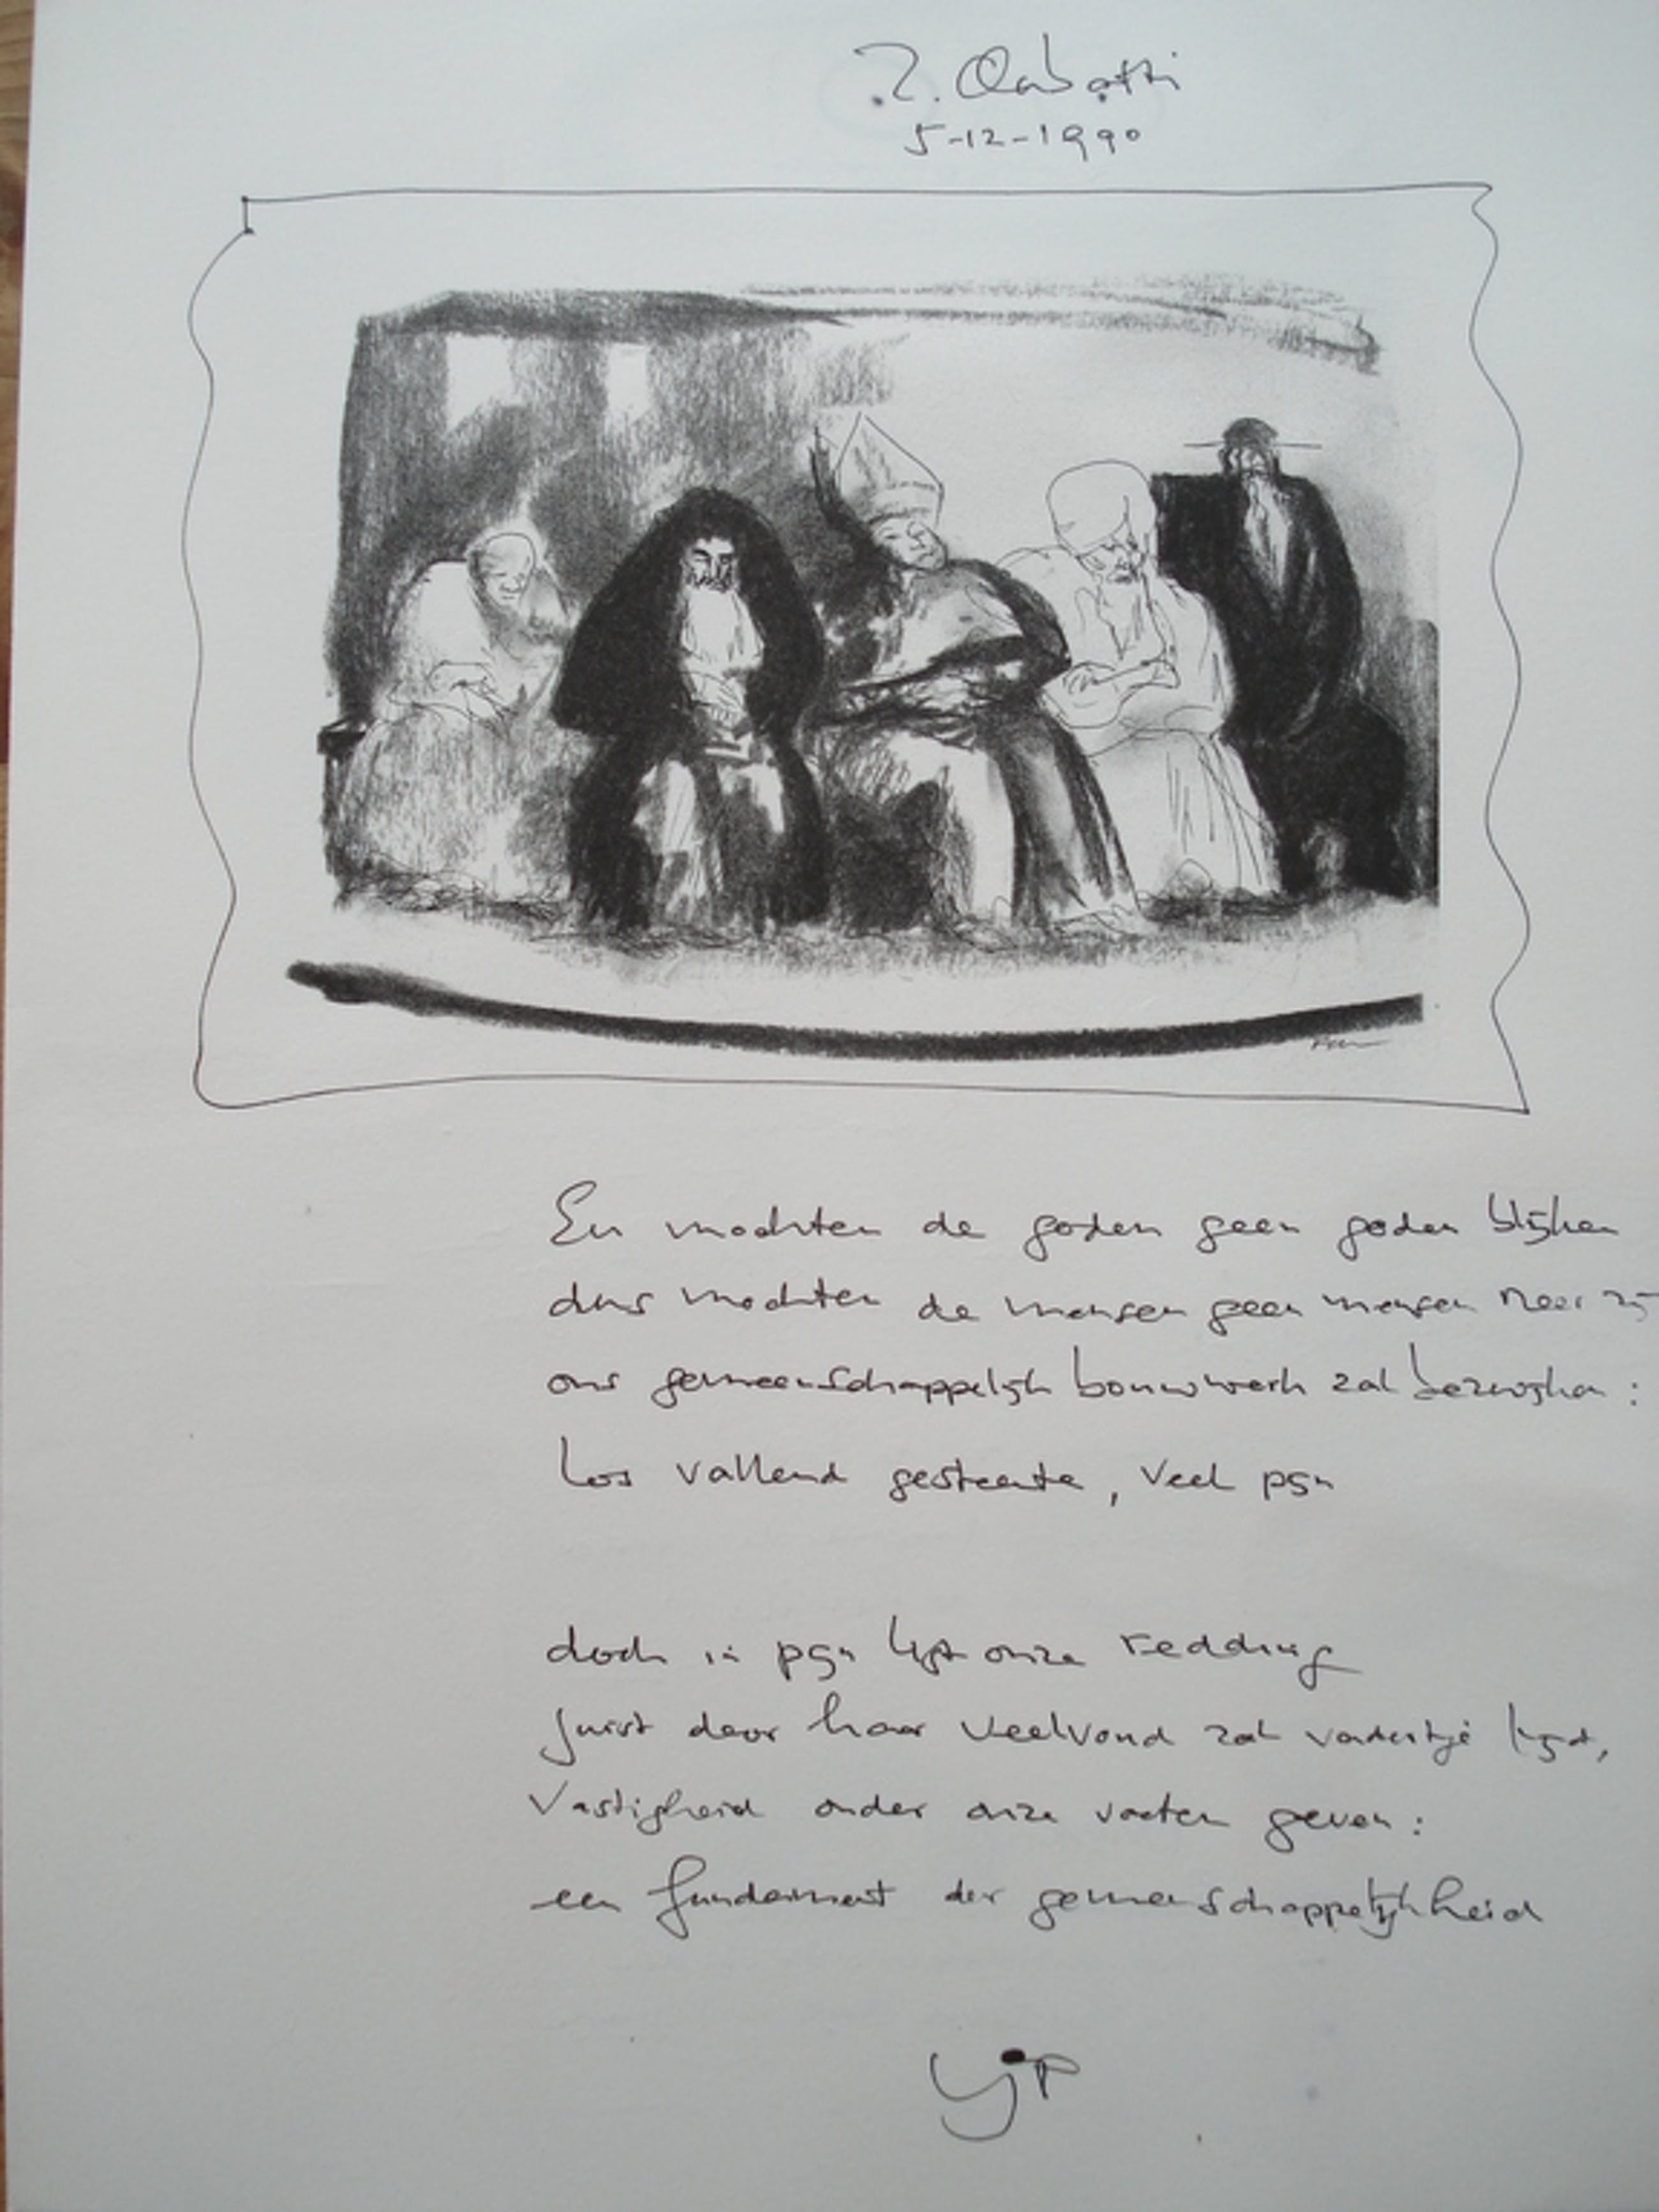 Z. Clabatti Acryl op litho/gedichten. Tekeningen L. Filcer kopen? Bied vanaf 1!